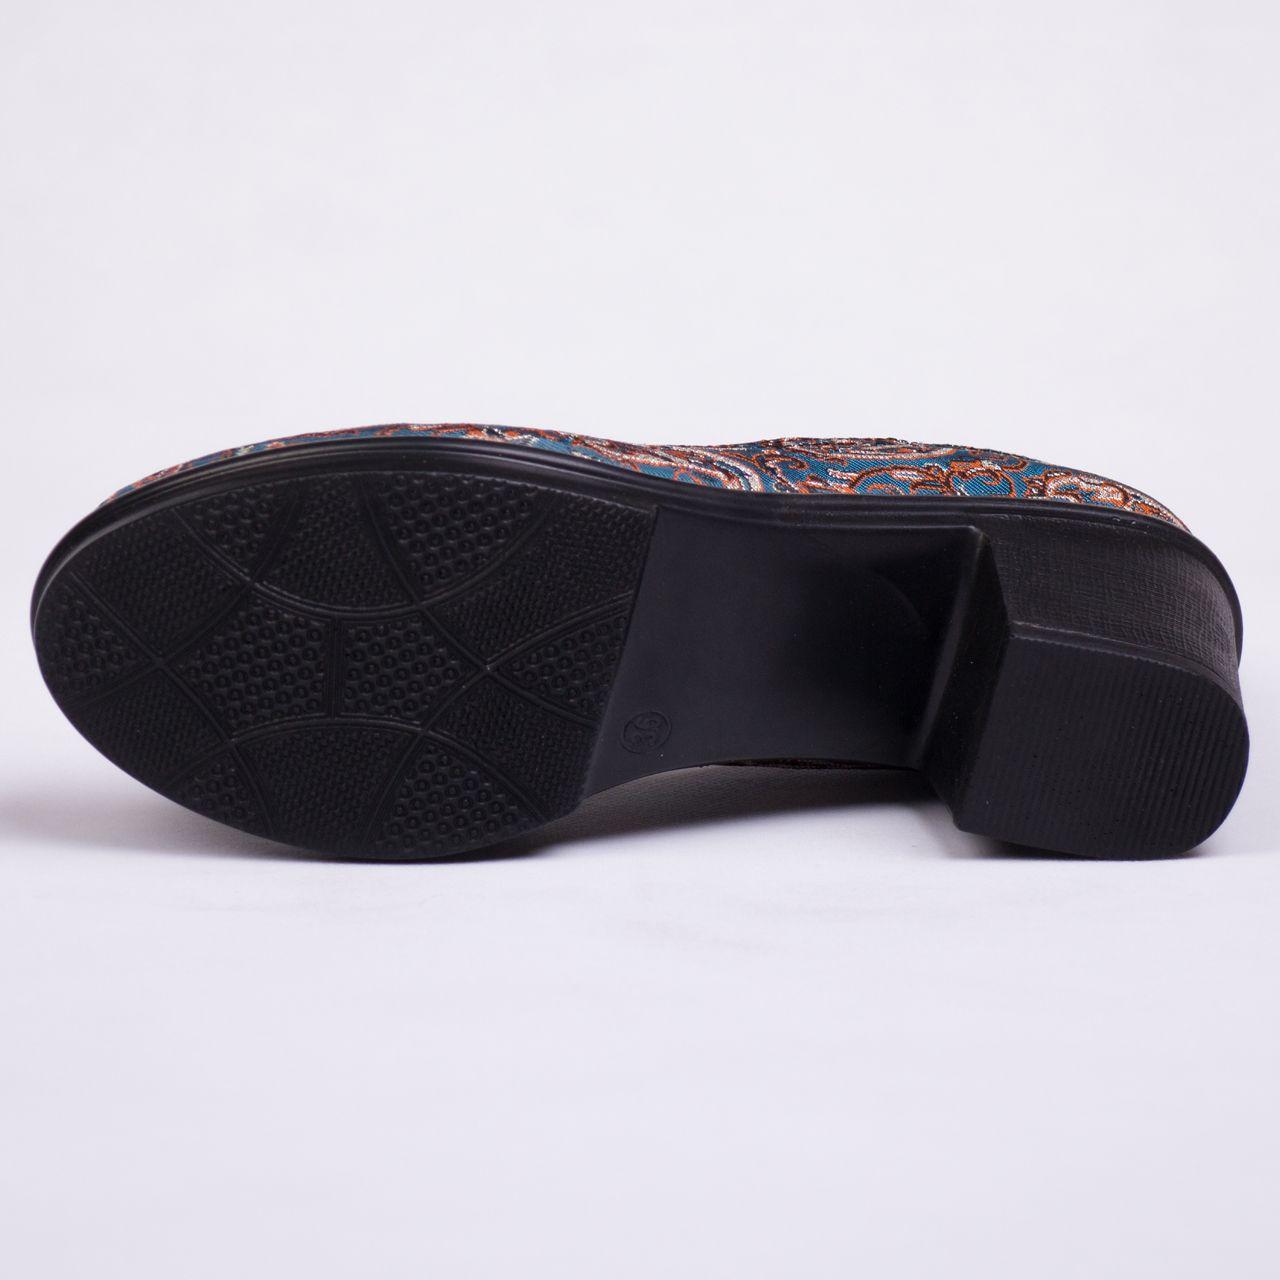 کفش زنانه کد TS-5 -  - 3